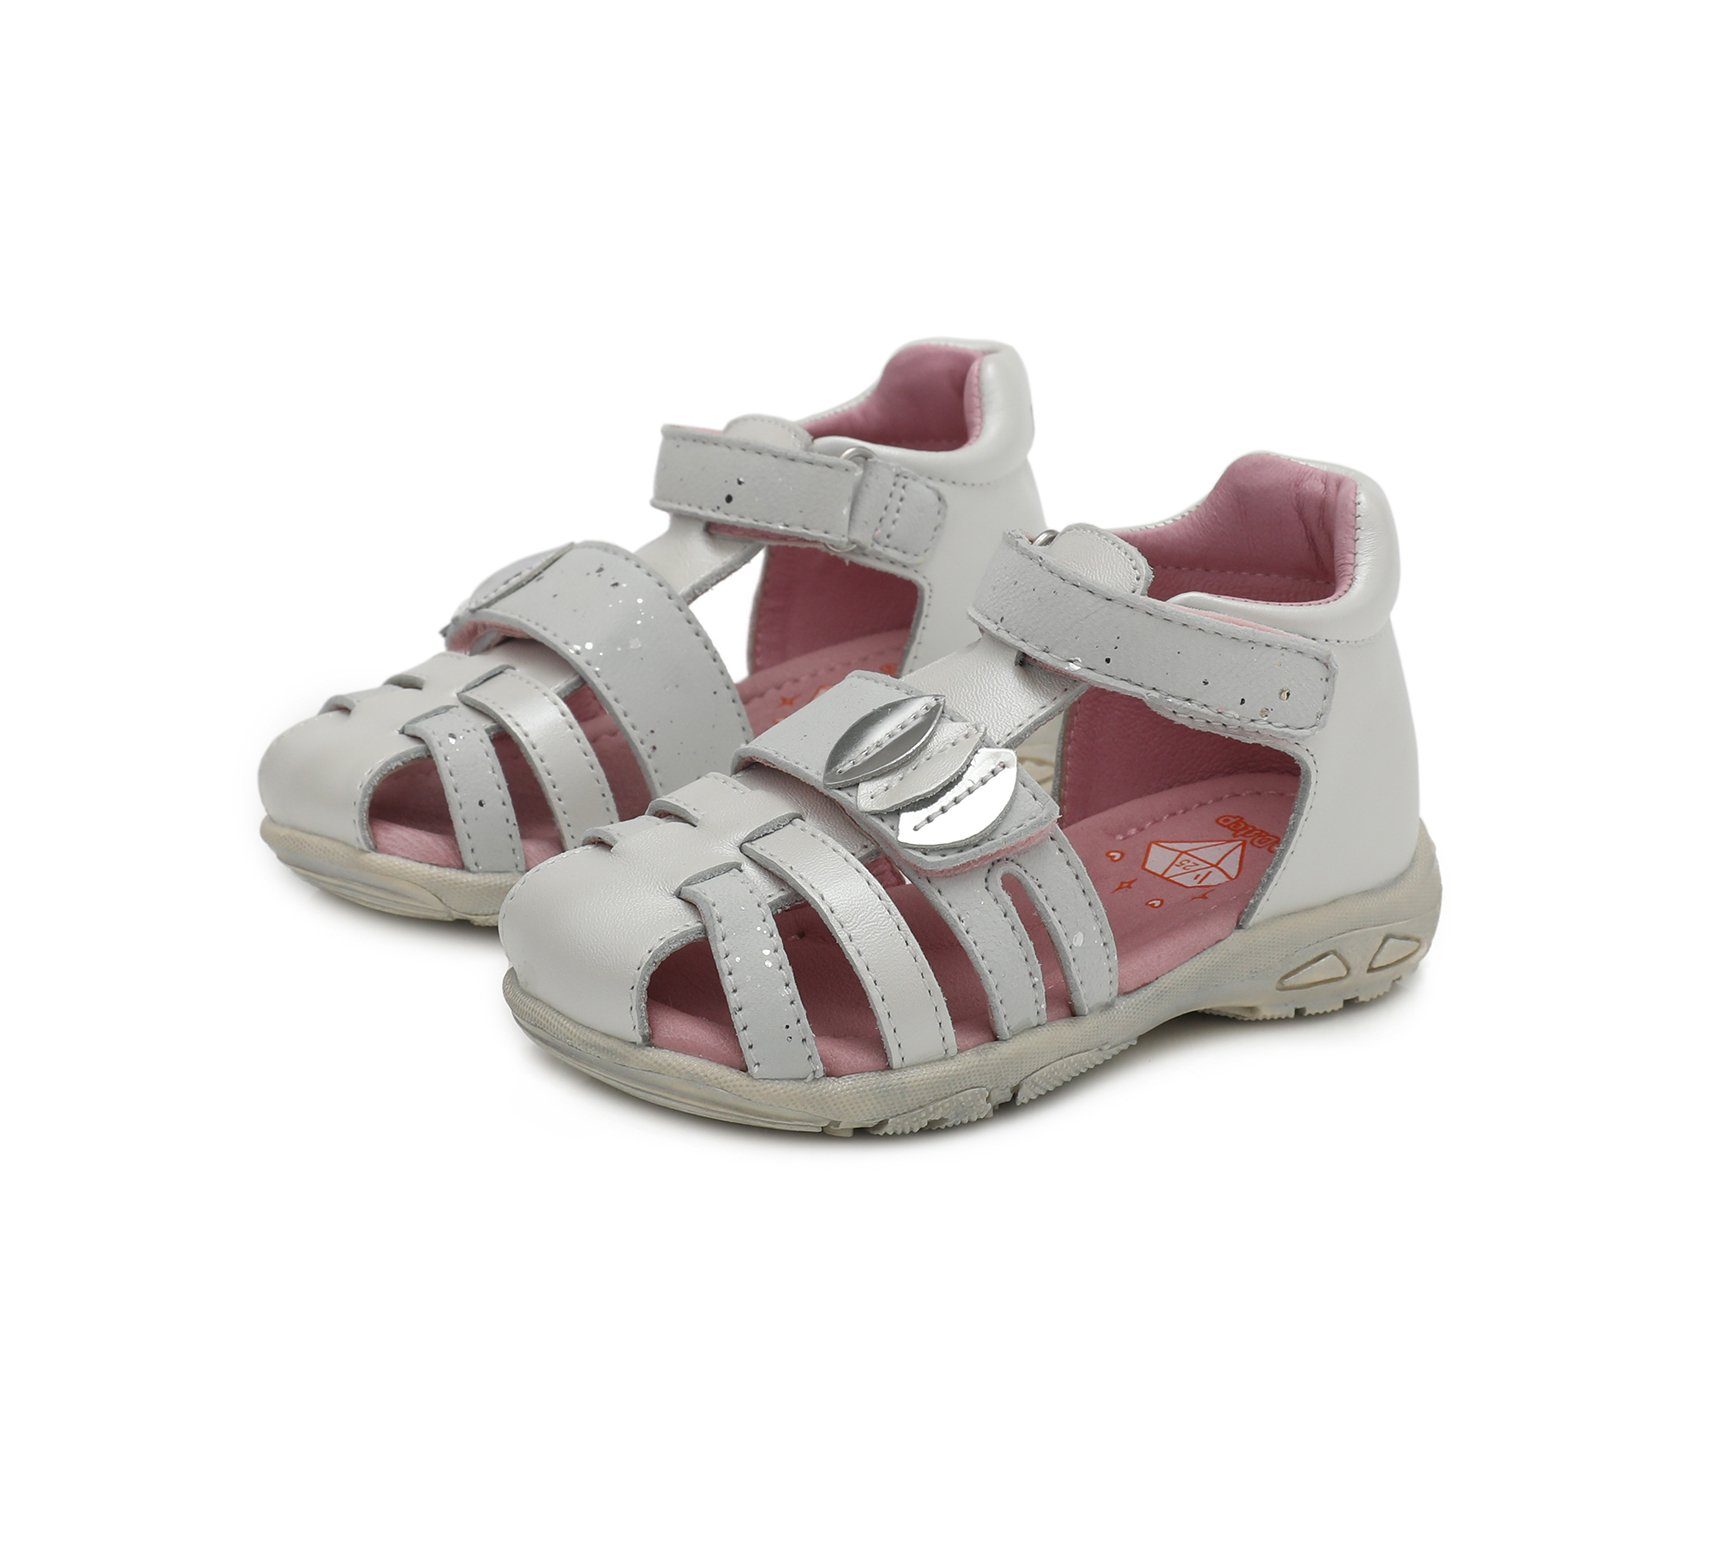 Sandals D.D.Step AC290-788B